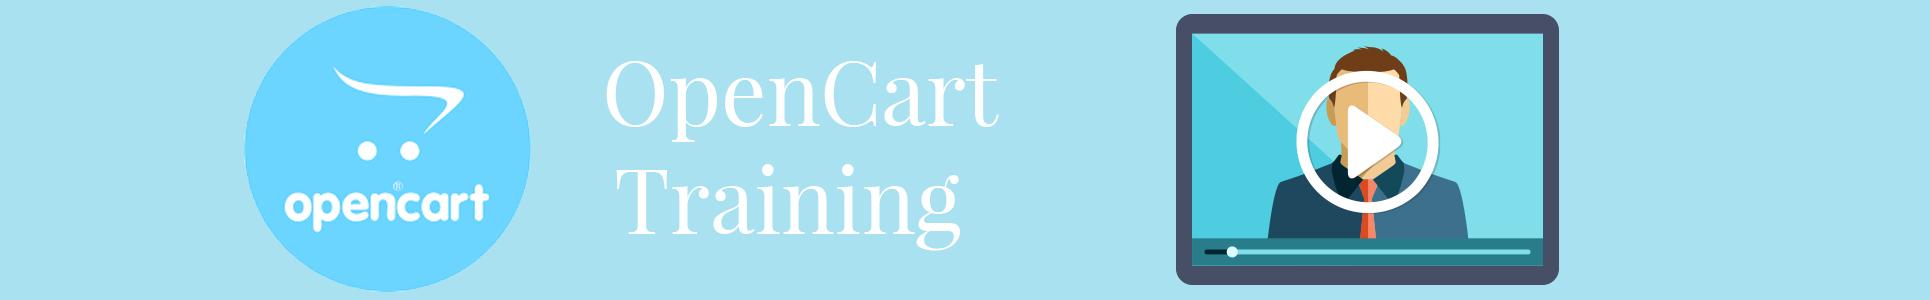 OpenCart Training